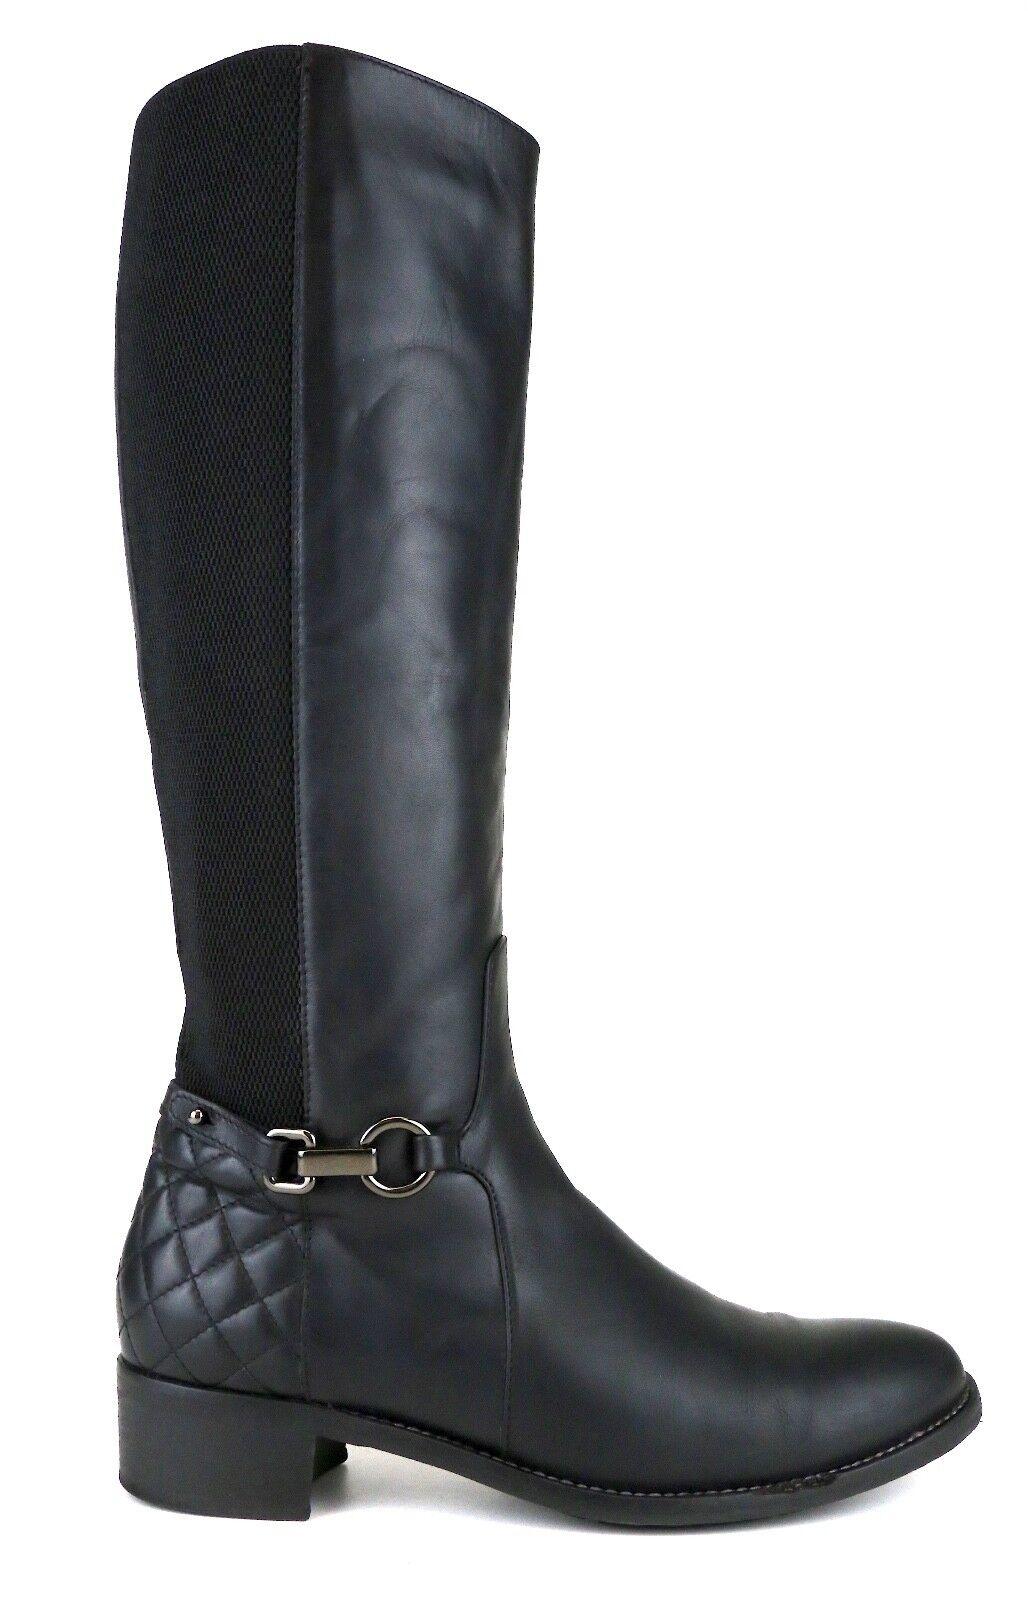 Aquatalia By Marvin K. Side Zip Knee Knee Knee High Leather Boot Black Women Sz 9.5 5291  71b3ae